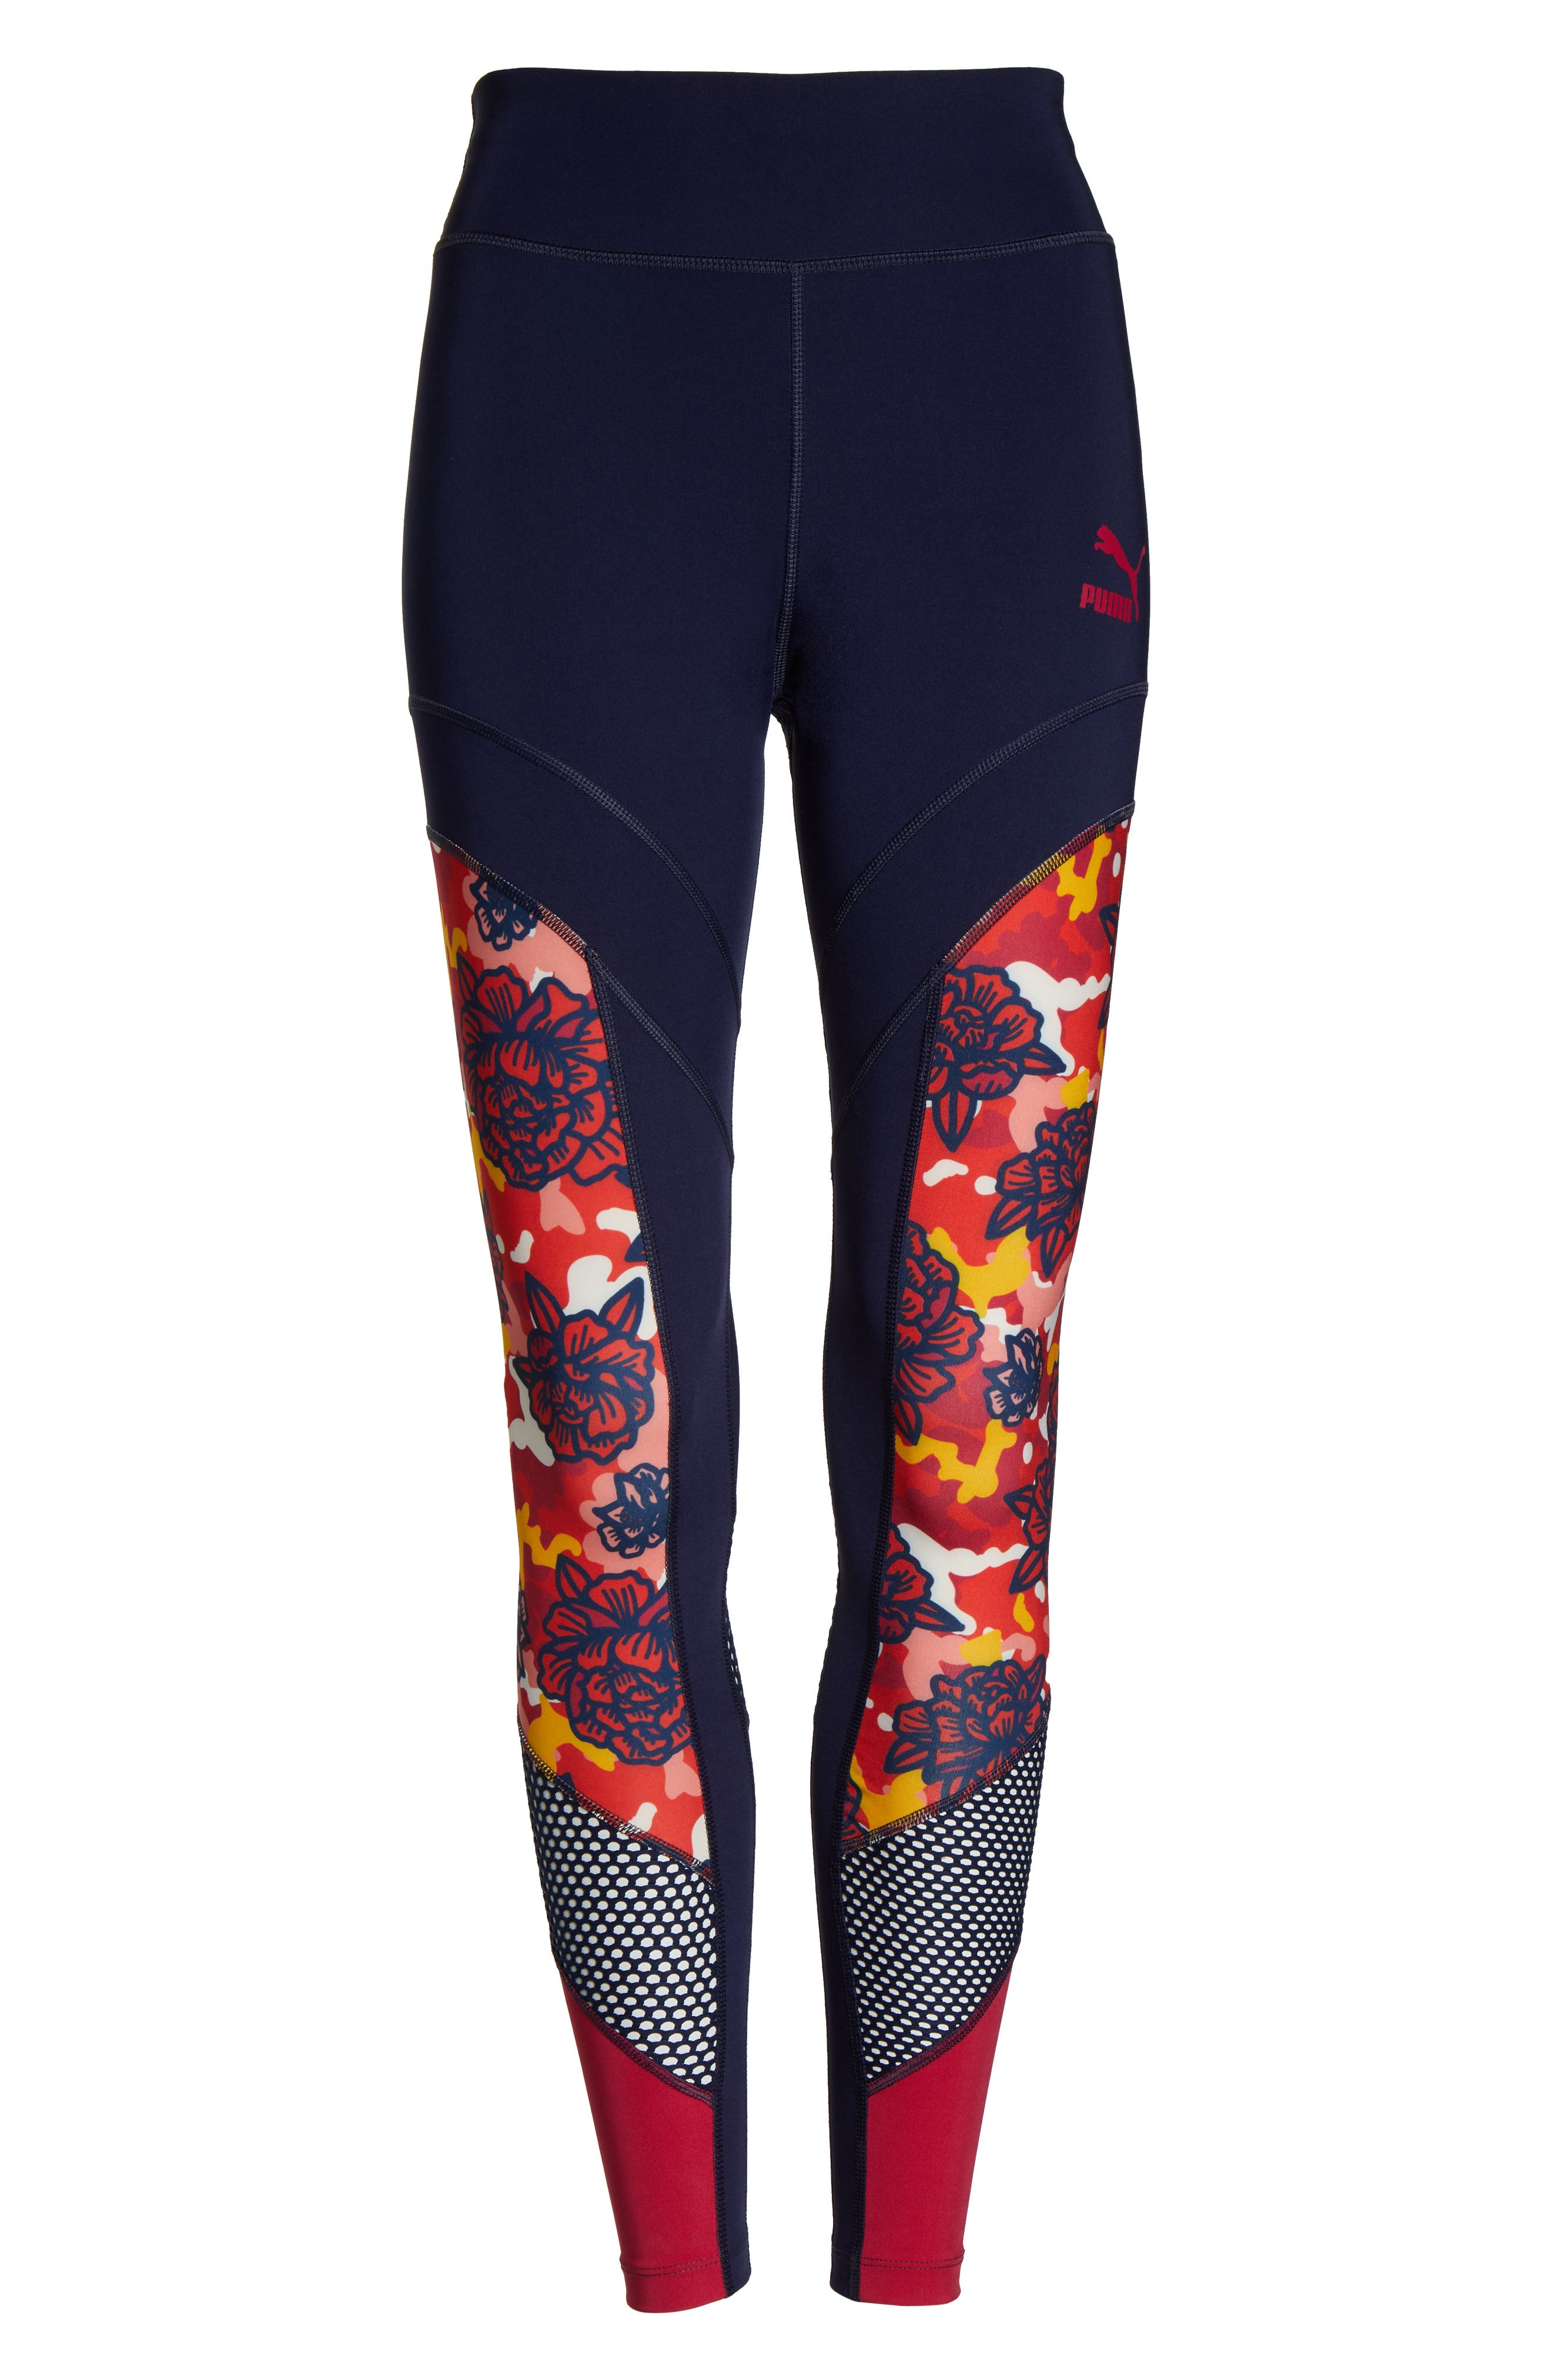 PUMA, Flourish Flourish XTG Leggings, Alternate thumbnail 7, color, PEACOAT-HIBISCUS MULTI